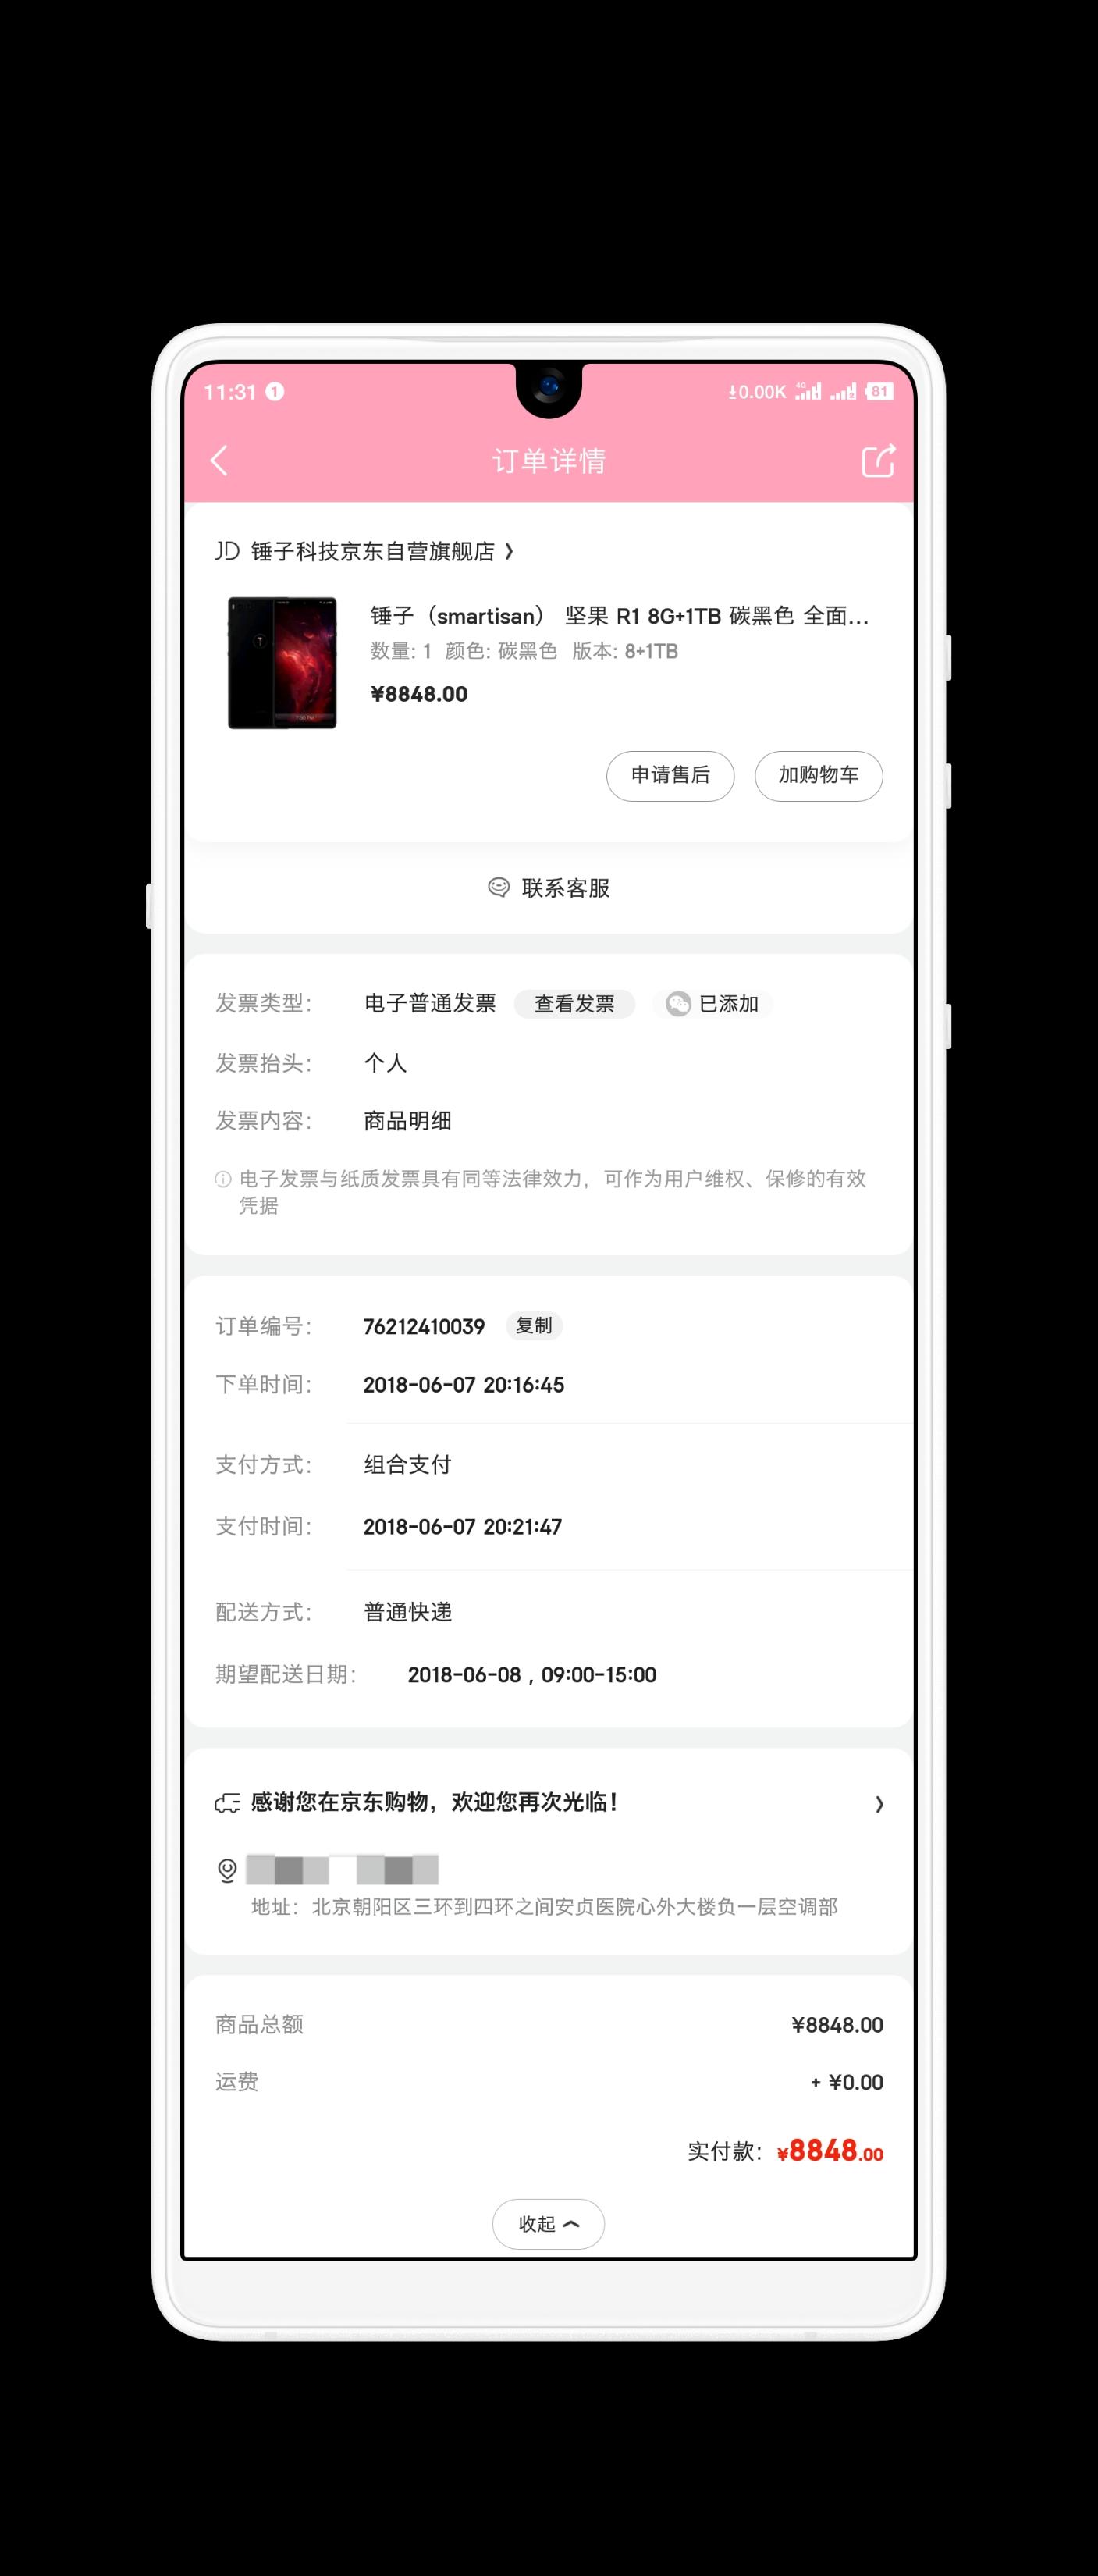 ??_Screenshot_2019-08-15-11-32-07-851_??.png